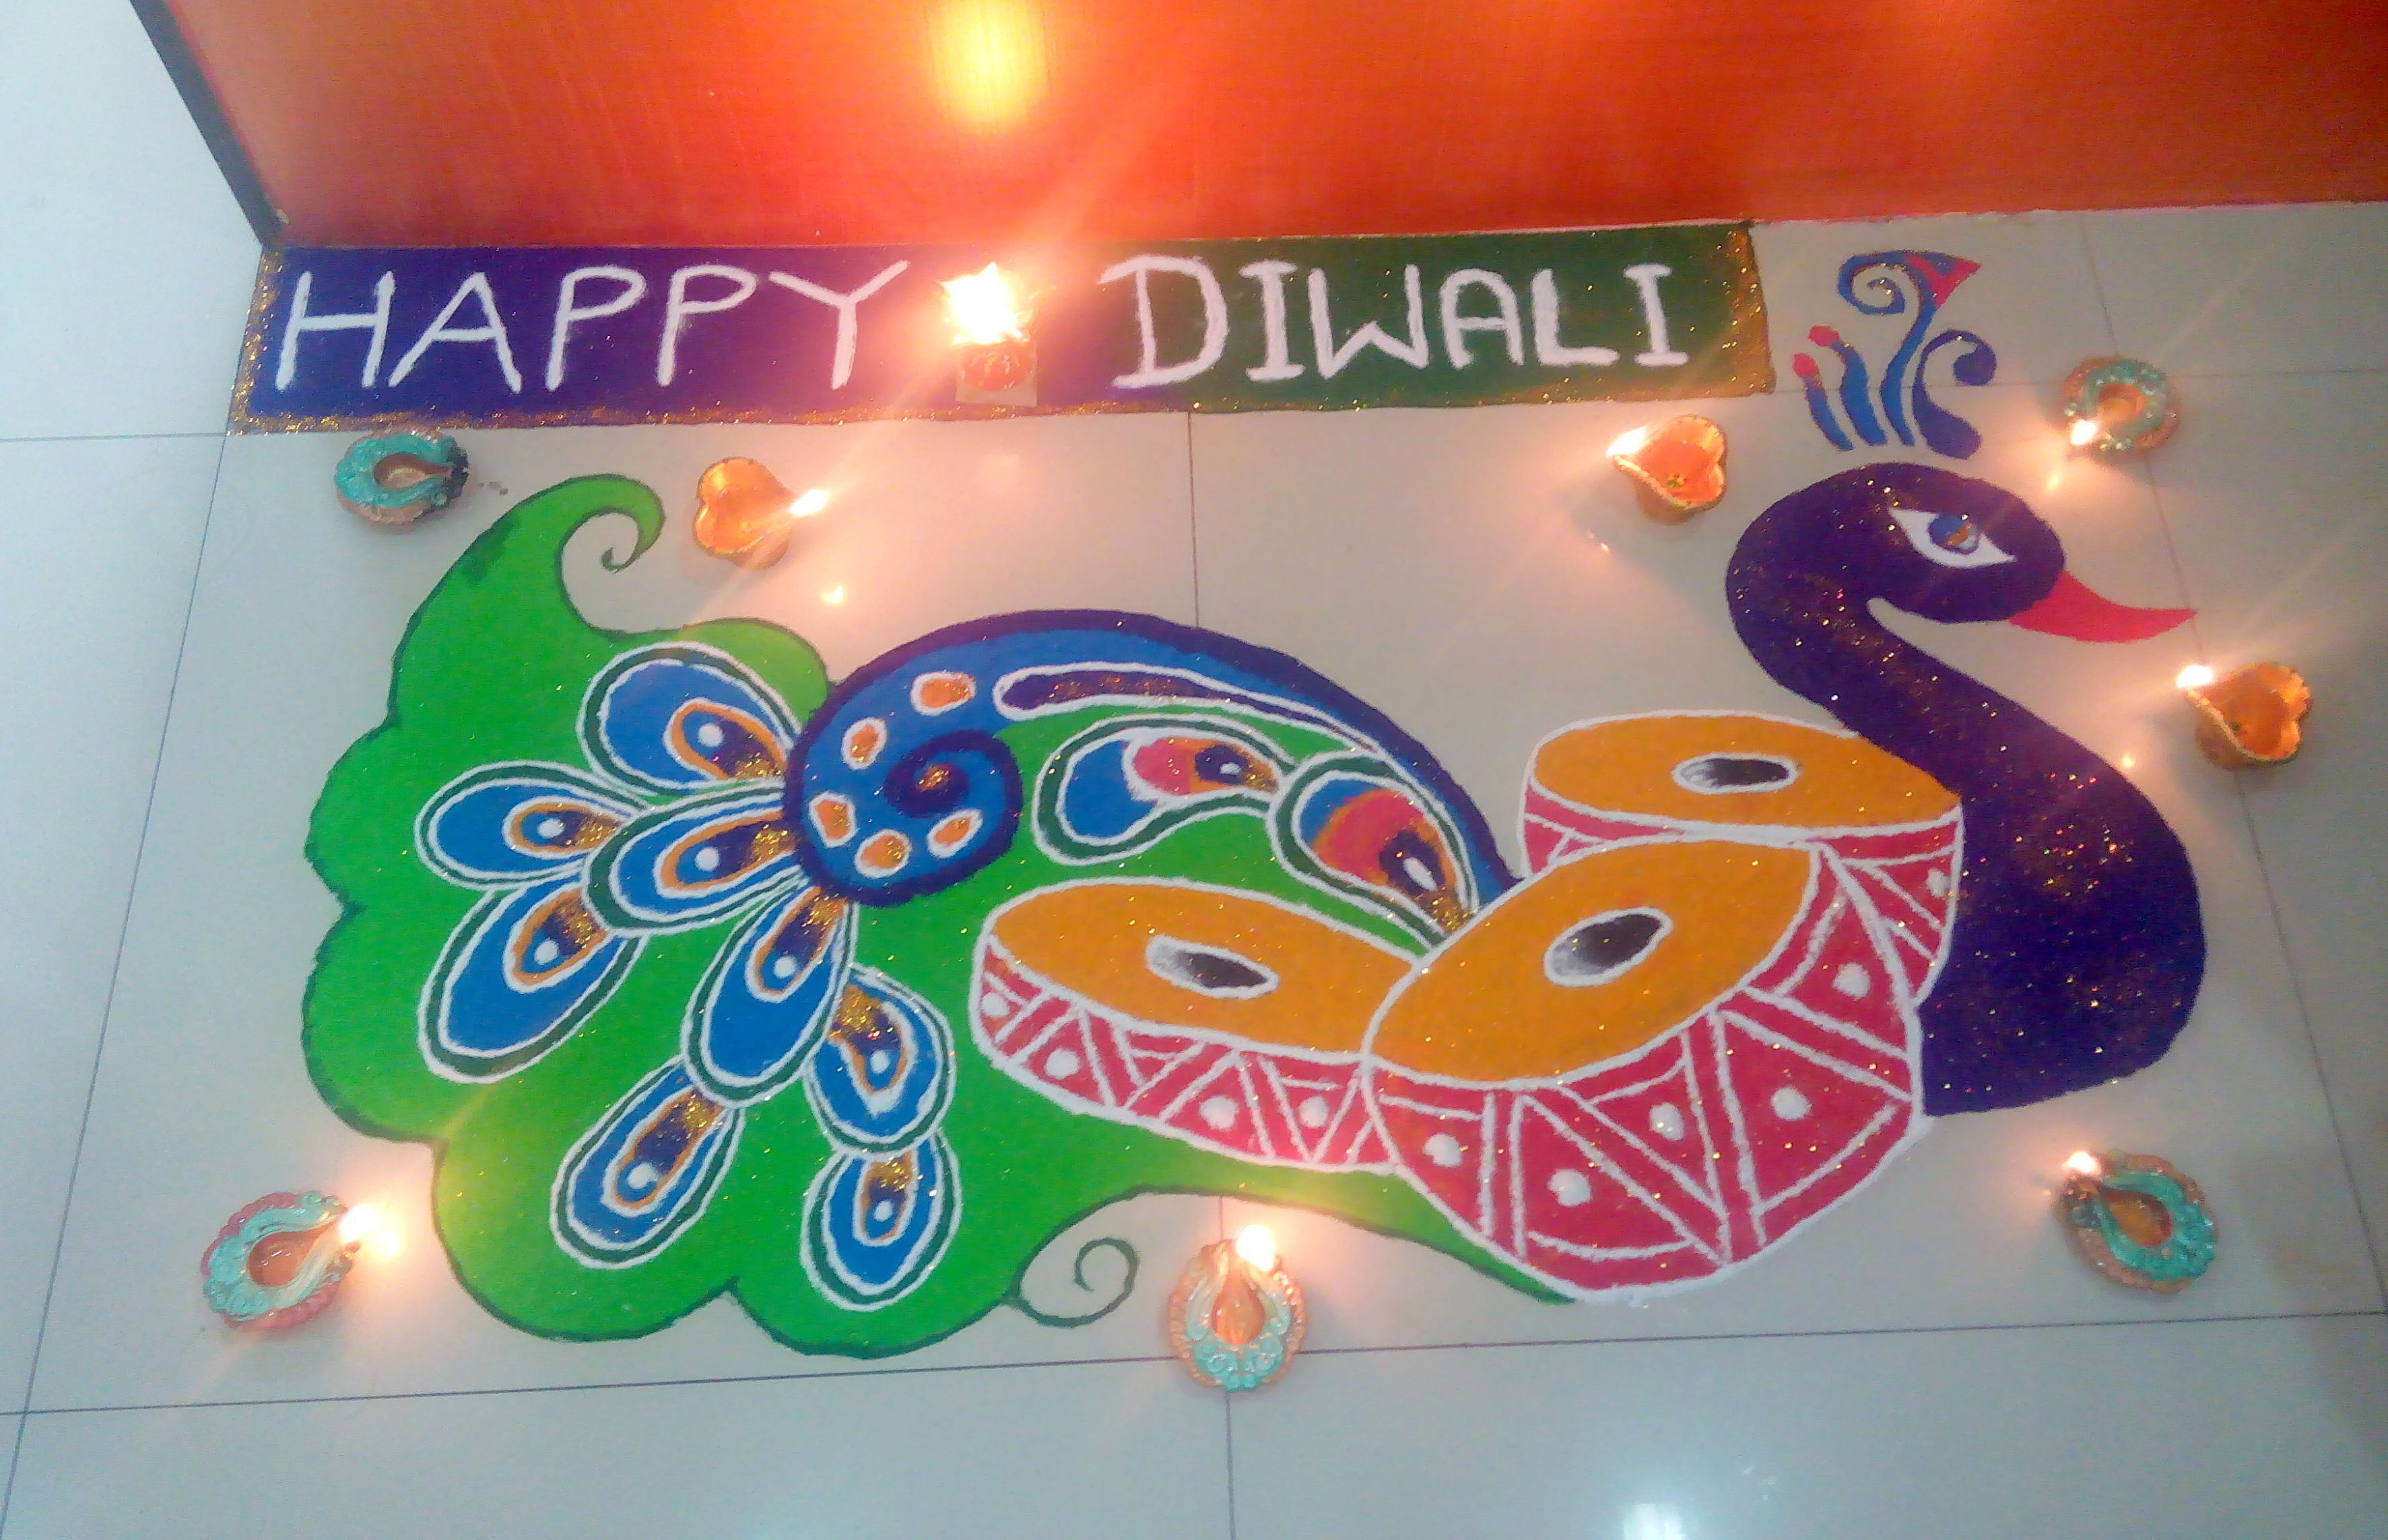 Rangoli Designs For Diwali 2016